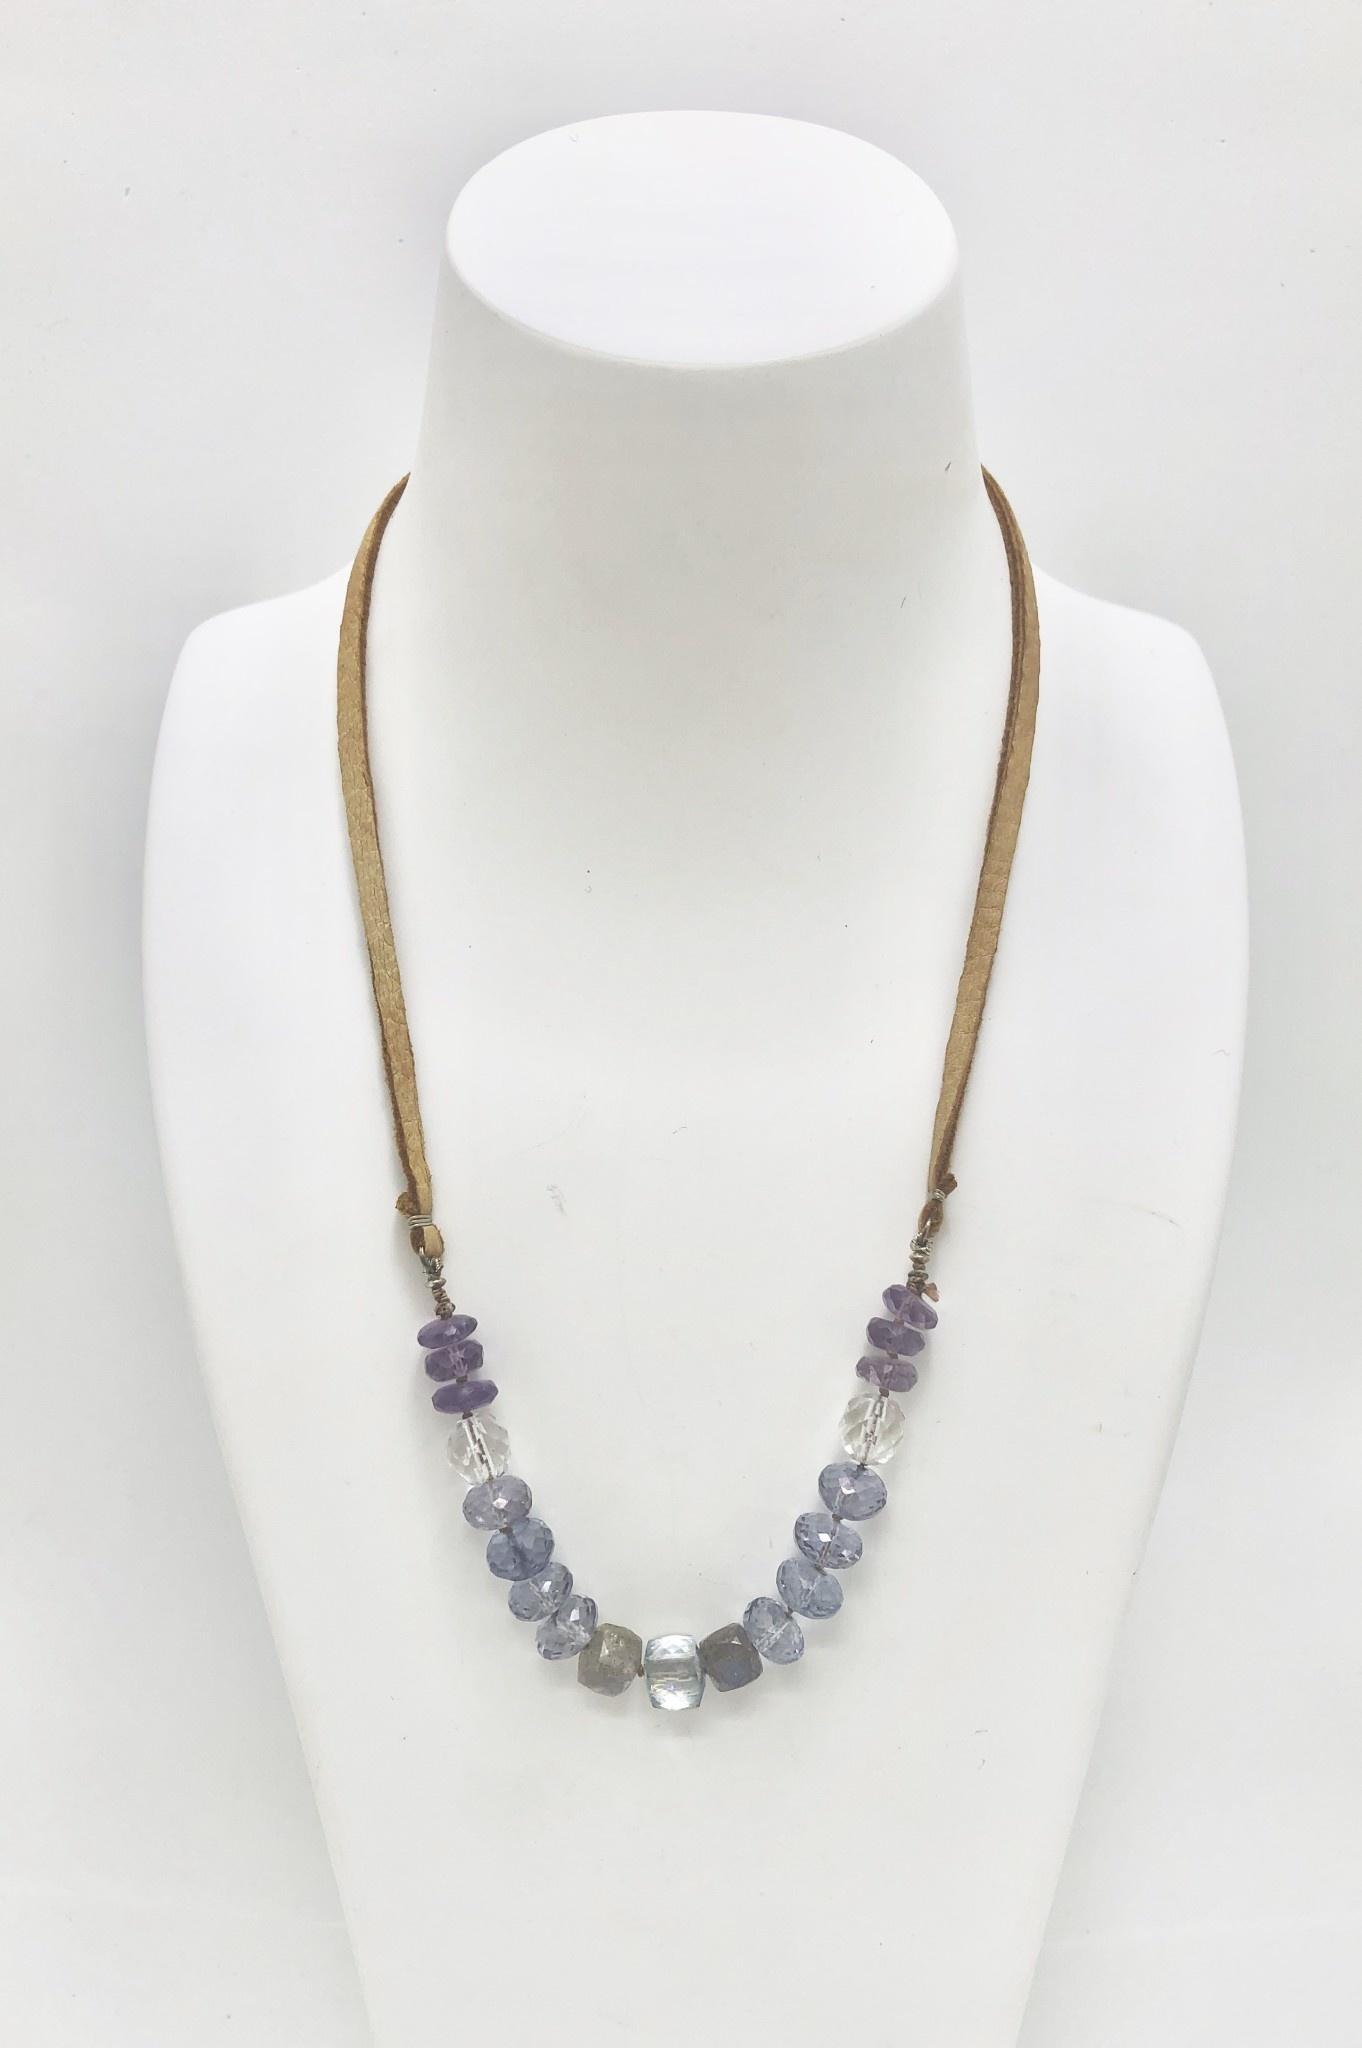 Amethyst, Crystal and Labradorite on Caramel Buckskin Necklace